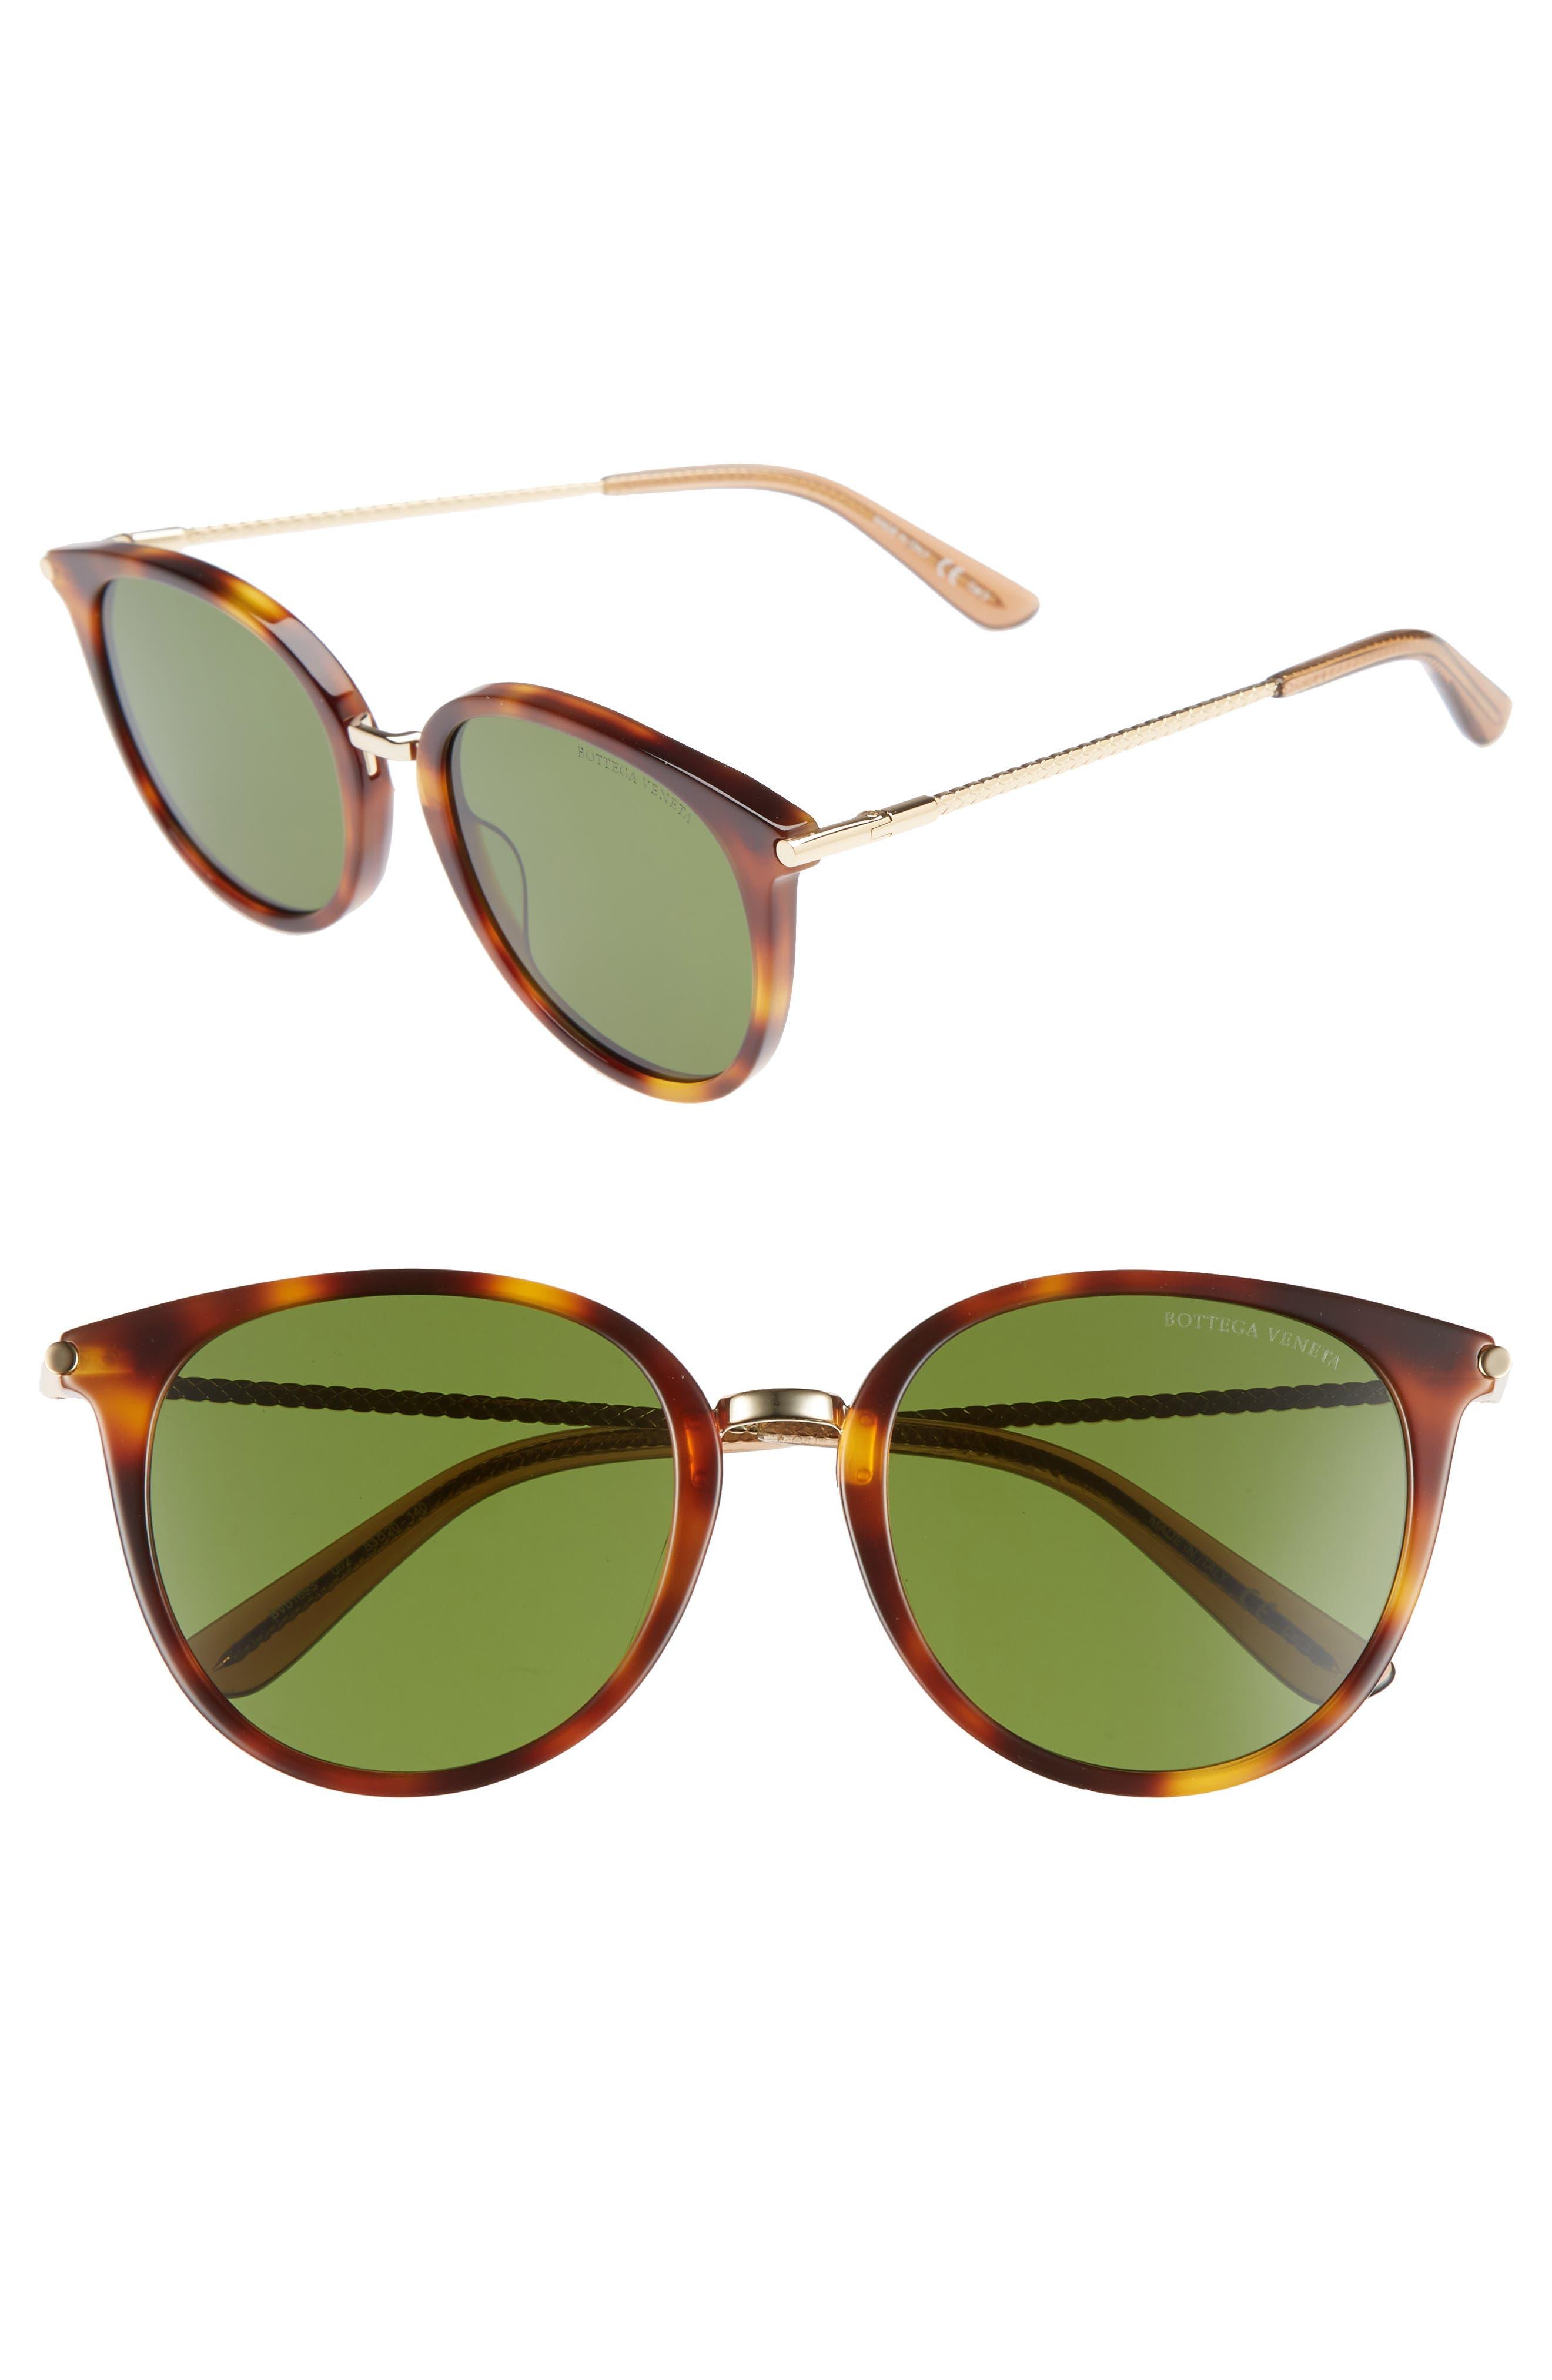 Alternate Image 1 Selected - Bottega Veneta 53mm Sunglasses